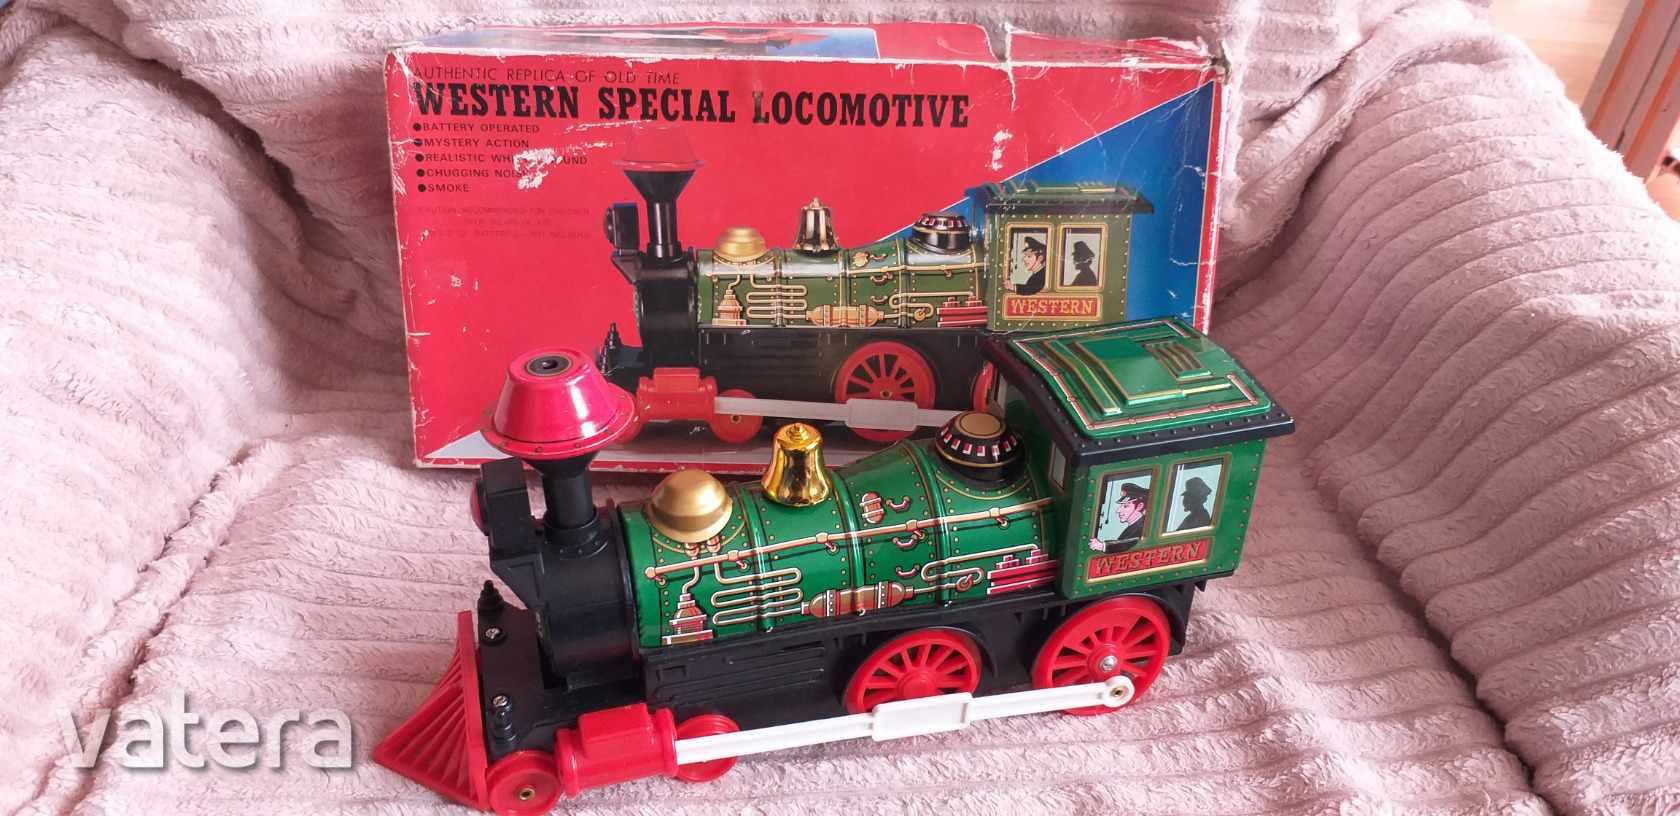 regi-dobozos-western-special-locomotive-japan-jatek-178a_1_big.jpg